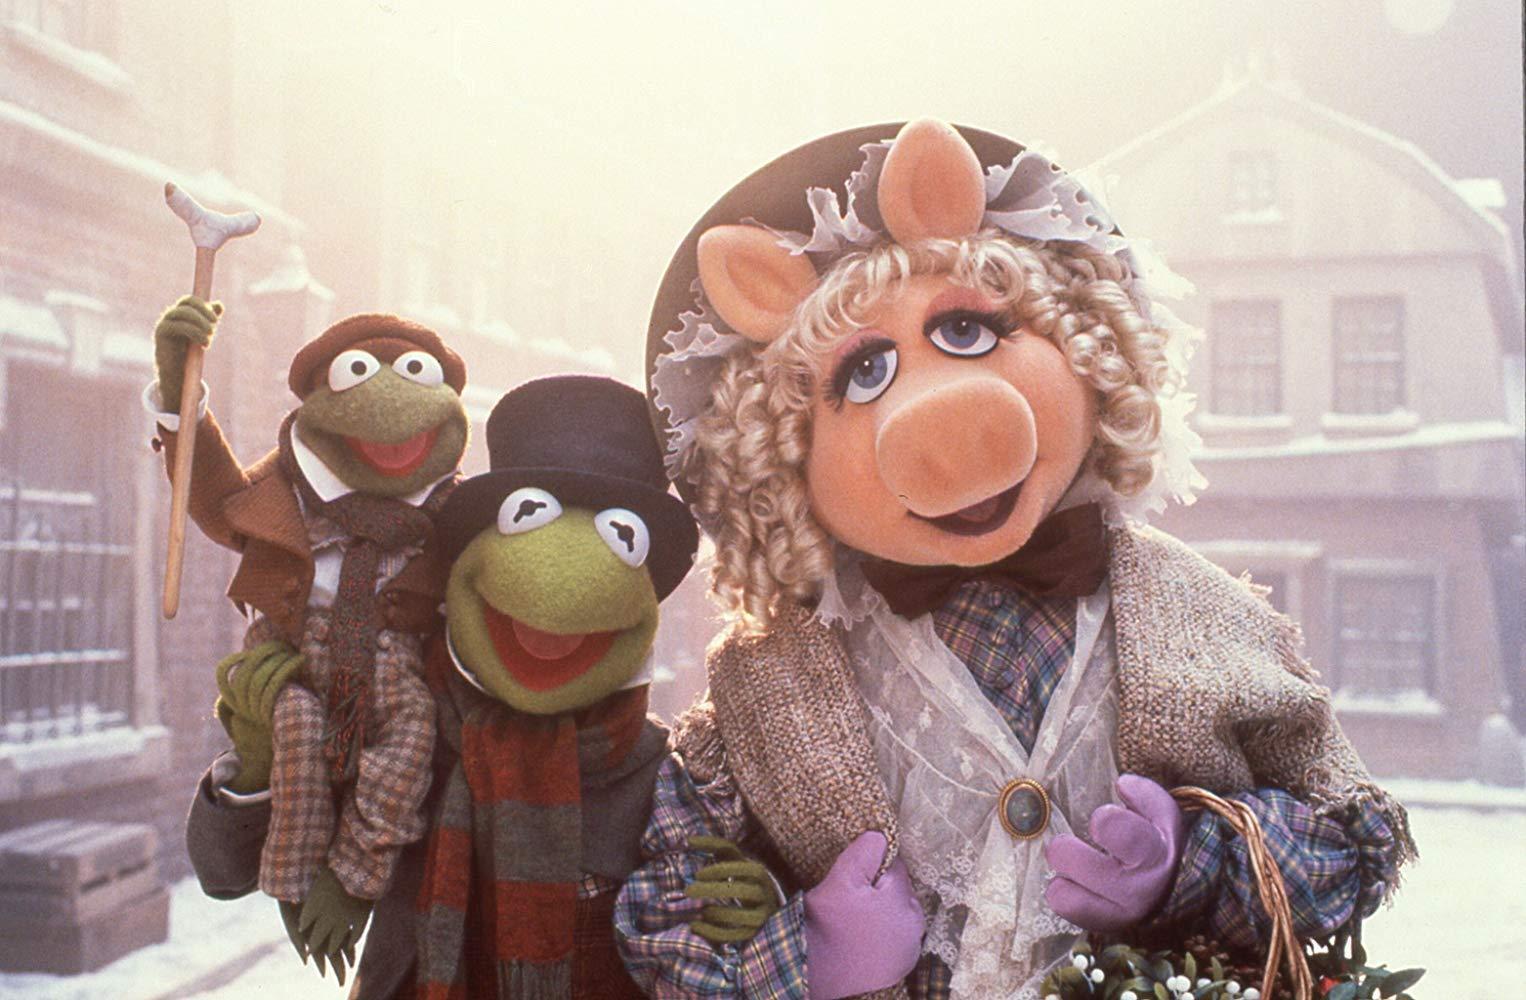 مشاهدة فيلم The Muppet Christmas Carol 1992 HD مترجم كامل اون لاين